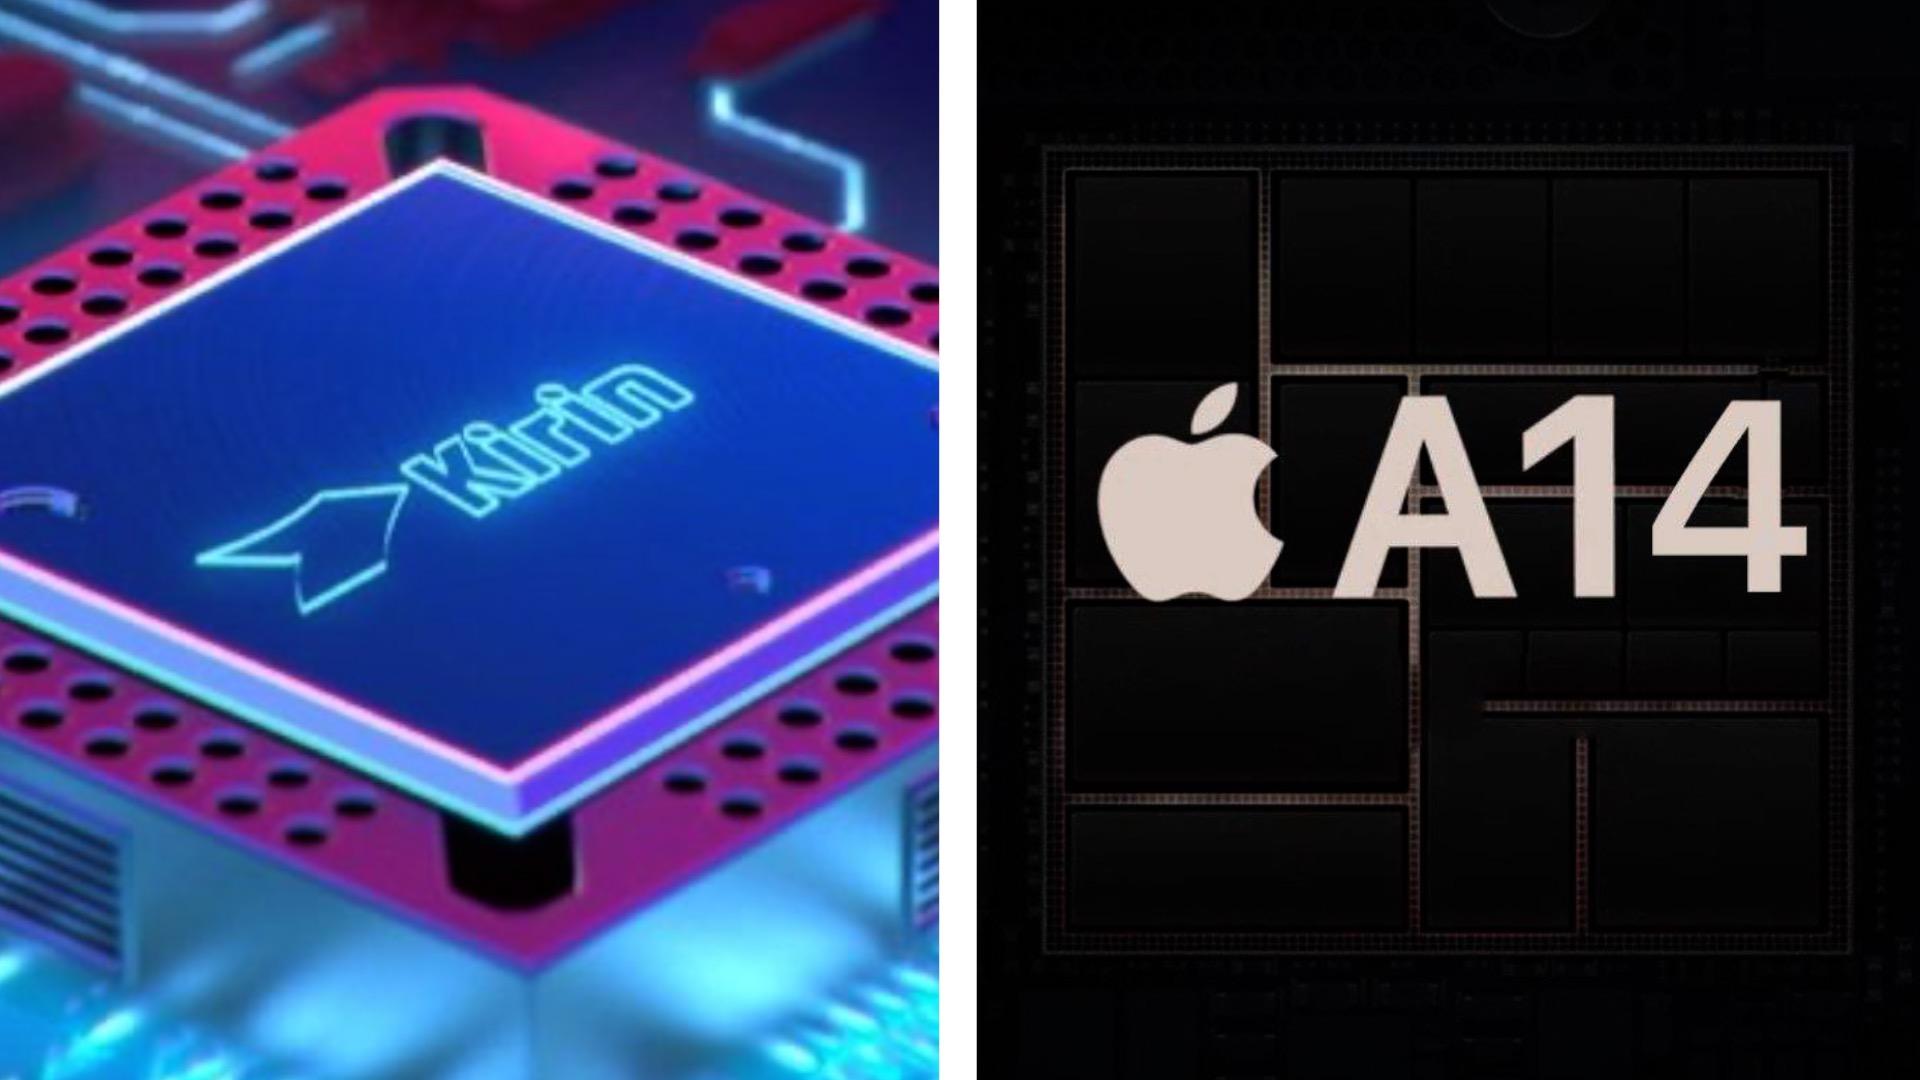 <a href='/huawei/'>Huawei</a> <a href='/kirin-1020/'>Kirin 1020</a> 5nm yongası <a href='/apple/'>Apple</a> A14'ten daha büyük ve daha pahalı olacak.